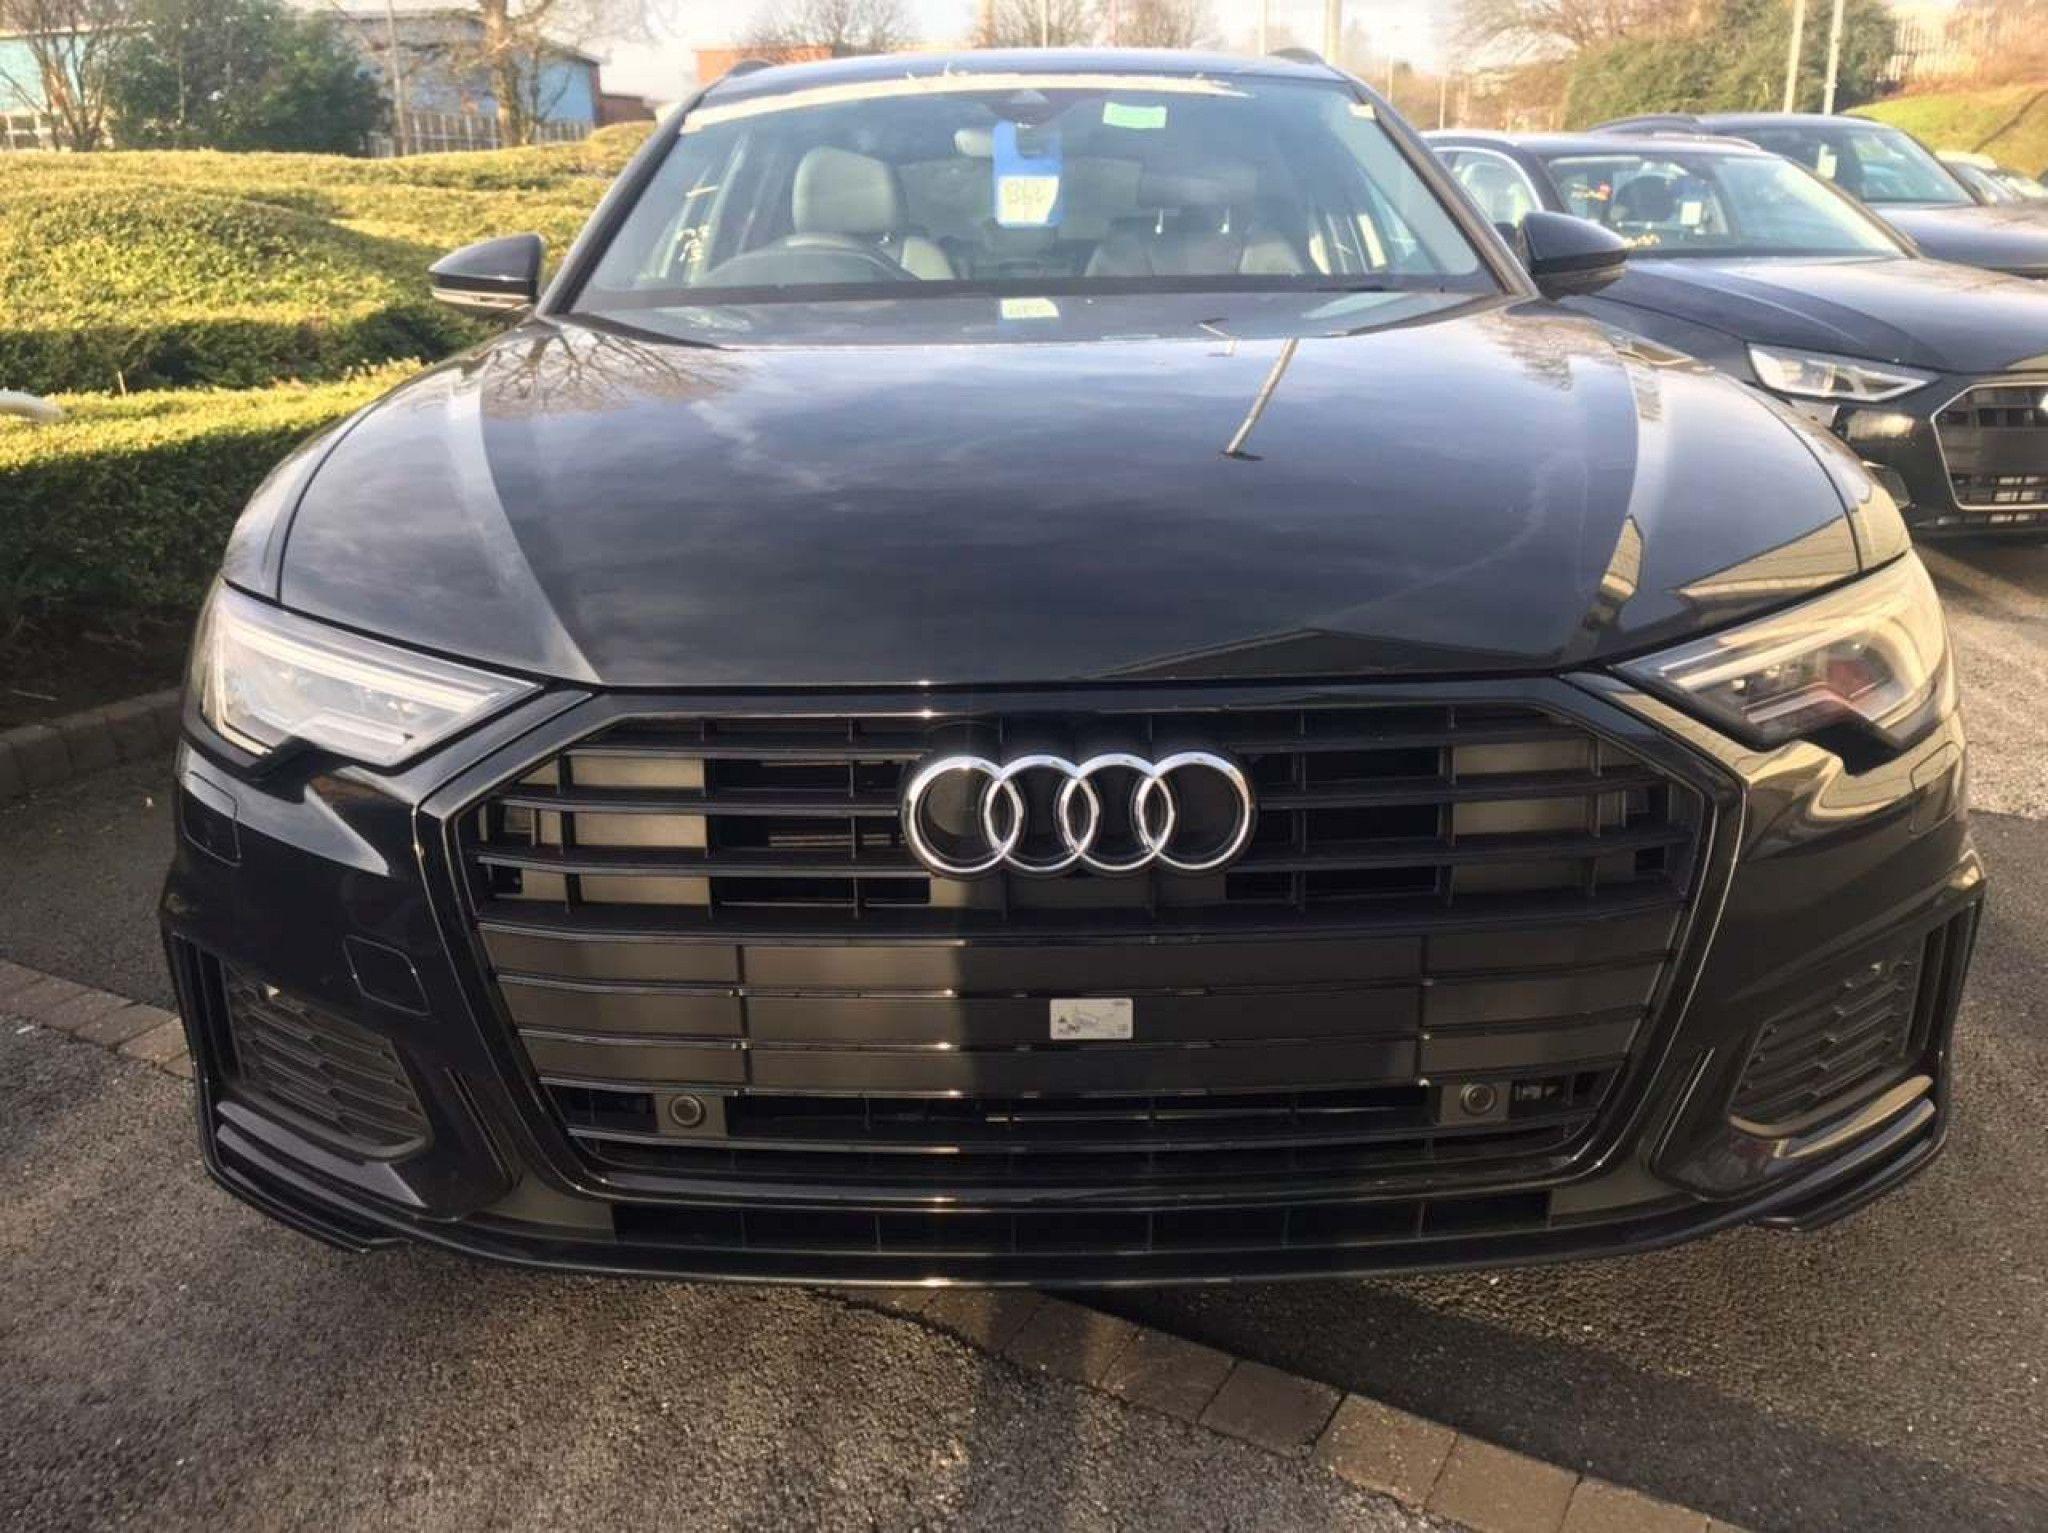 Audi A6 Avant 2 0 Tdi 40 Black Edition Avant S Tronic S S 5dr For Sale In 2020 Audi A6 Avant A6 Avant Audi A6